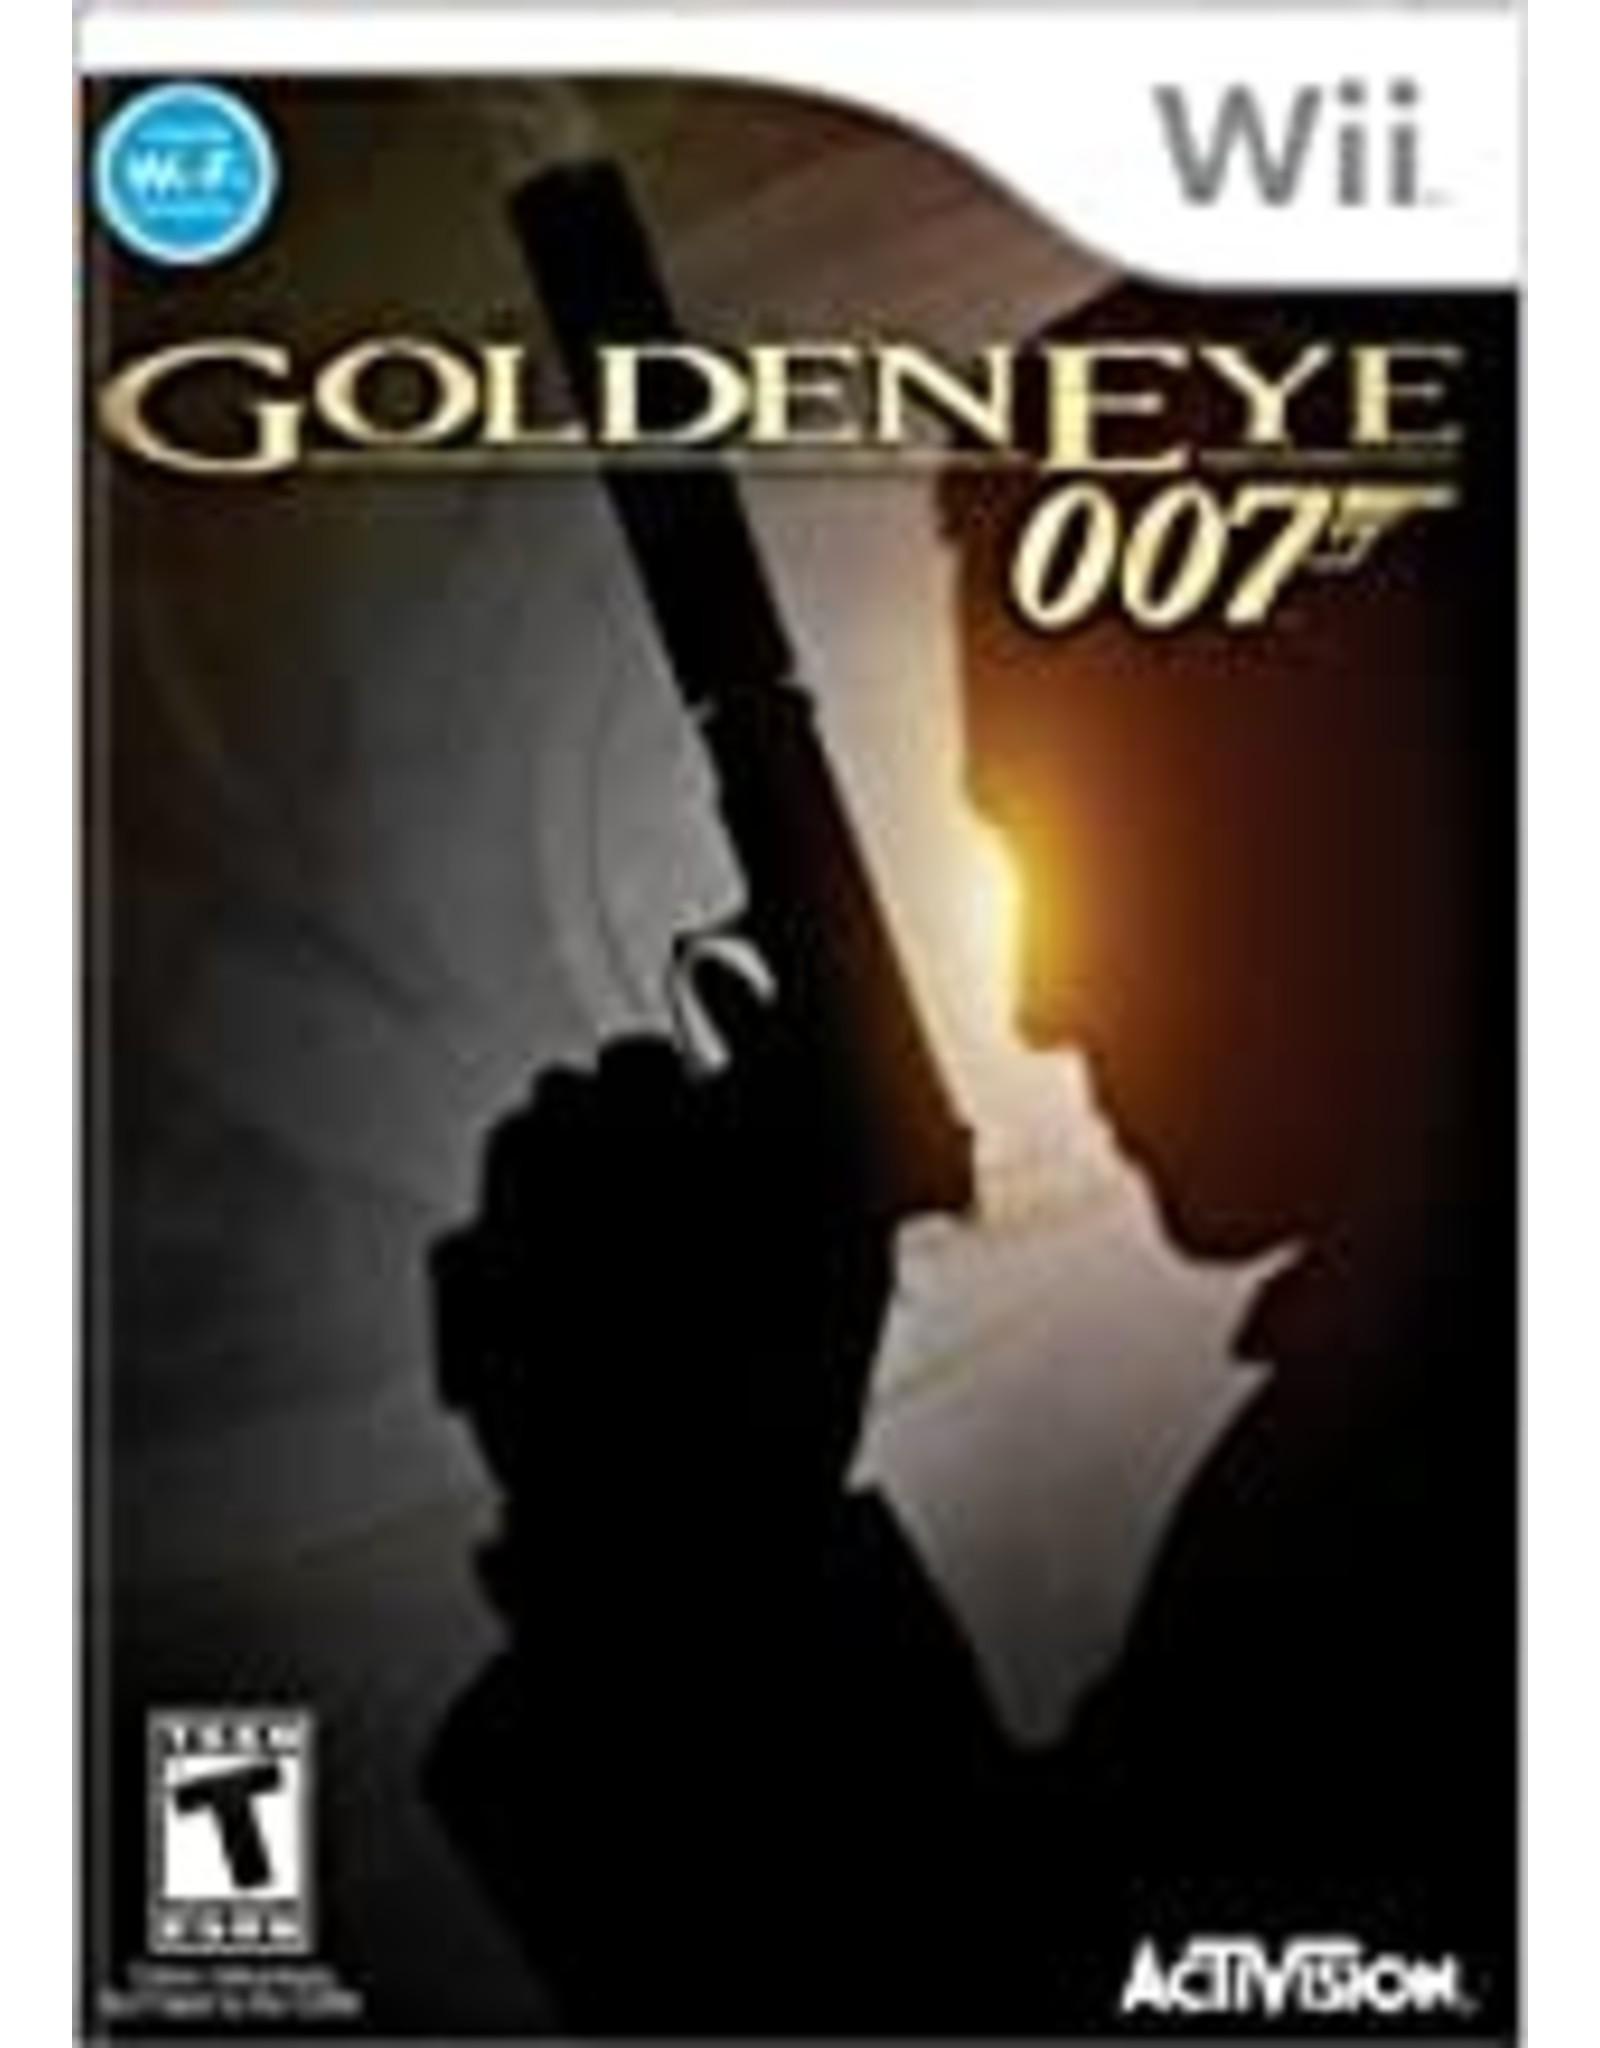 Wii 007 GoldenEye (CiB, Damaged Manual)